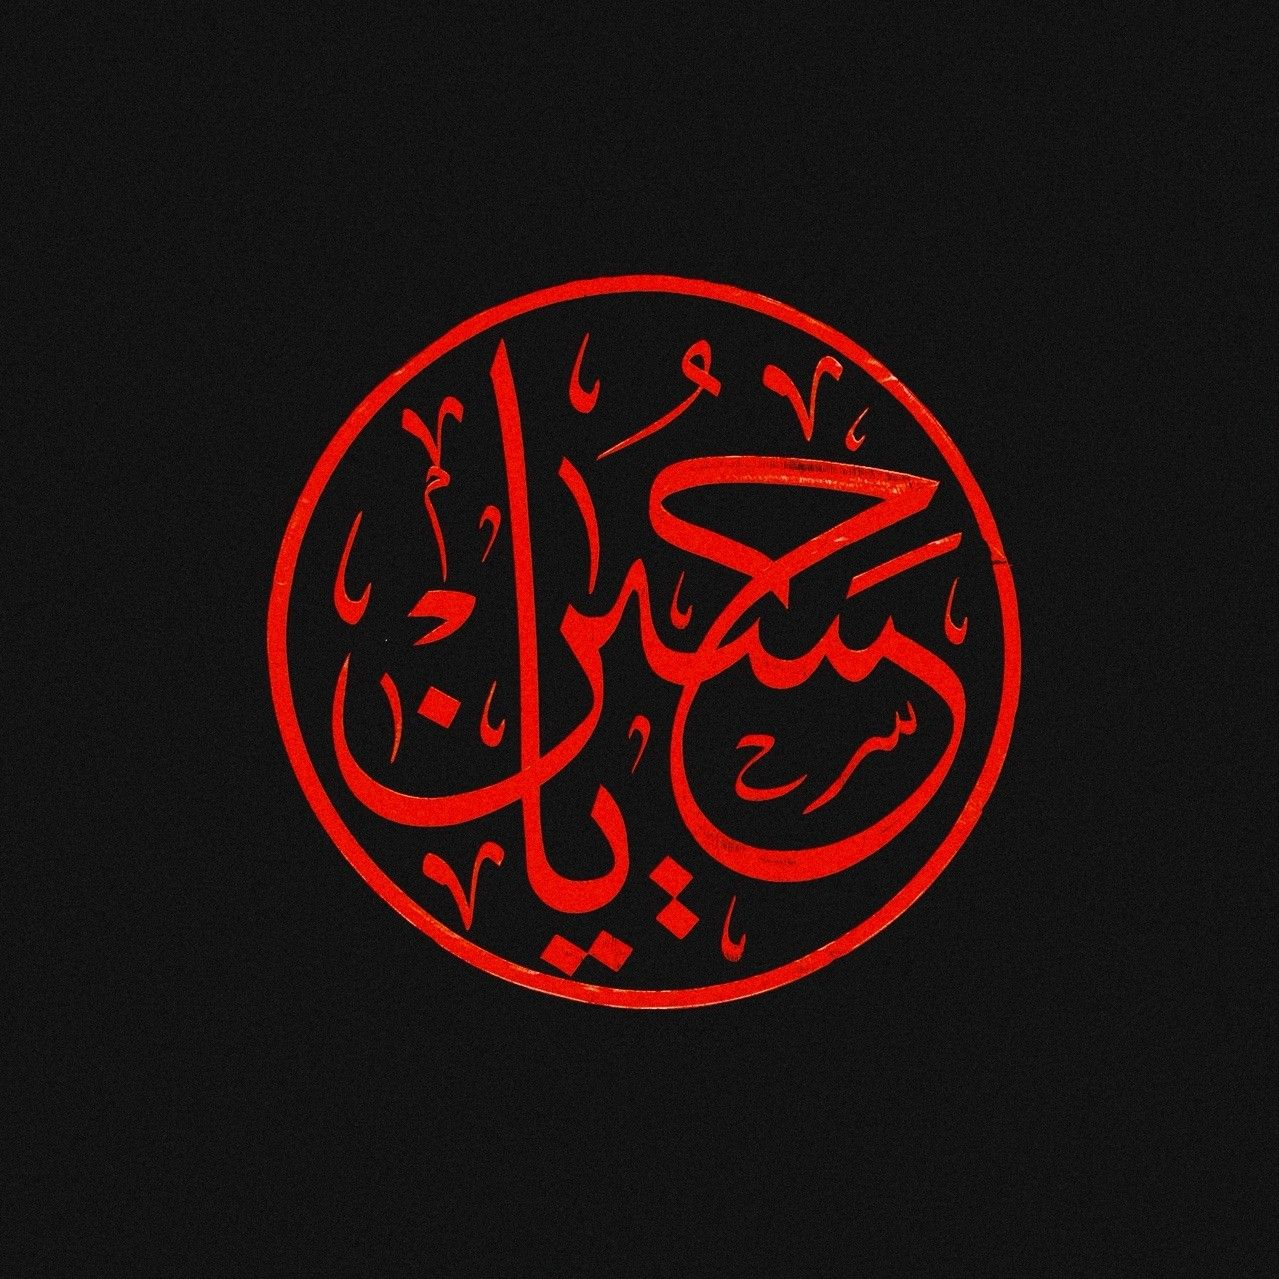 Pin By الورود الحمراء On حسينيات Islamic Art Calligraphy Arabic Calligraphy Artwork Islamic Artwork